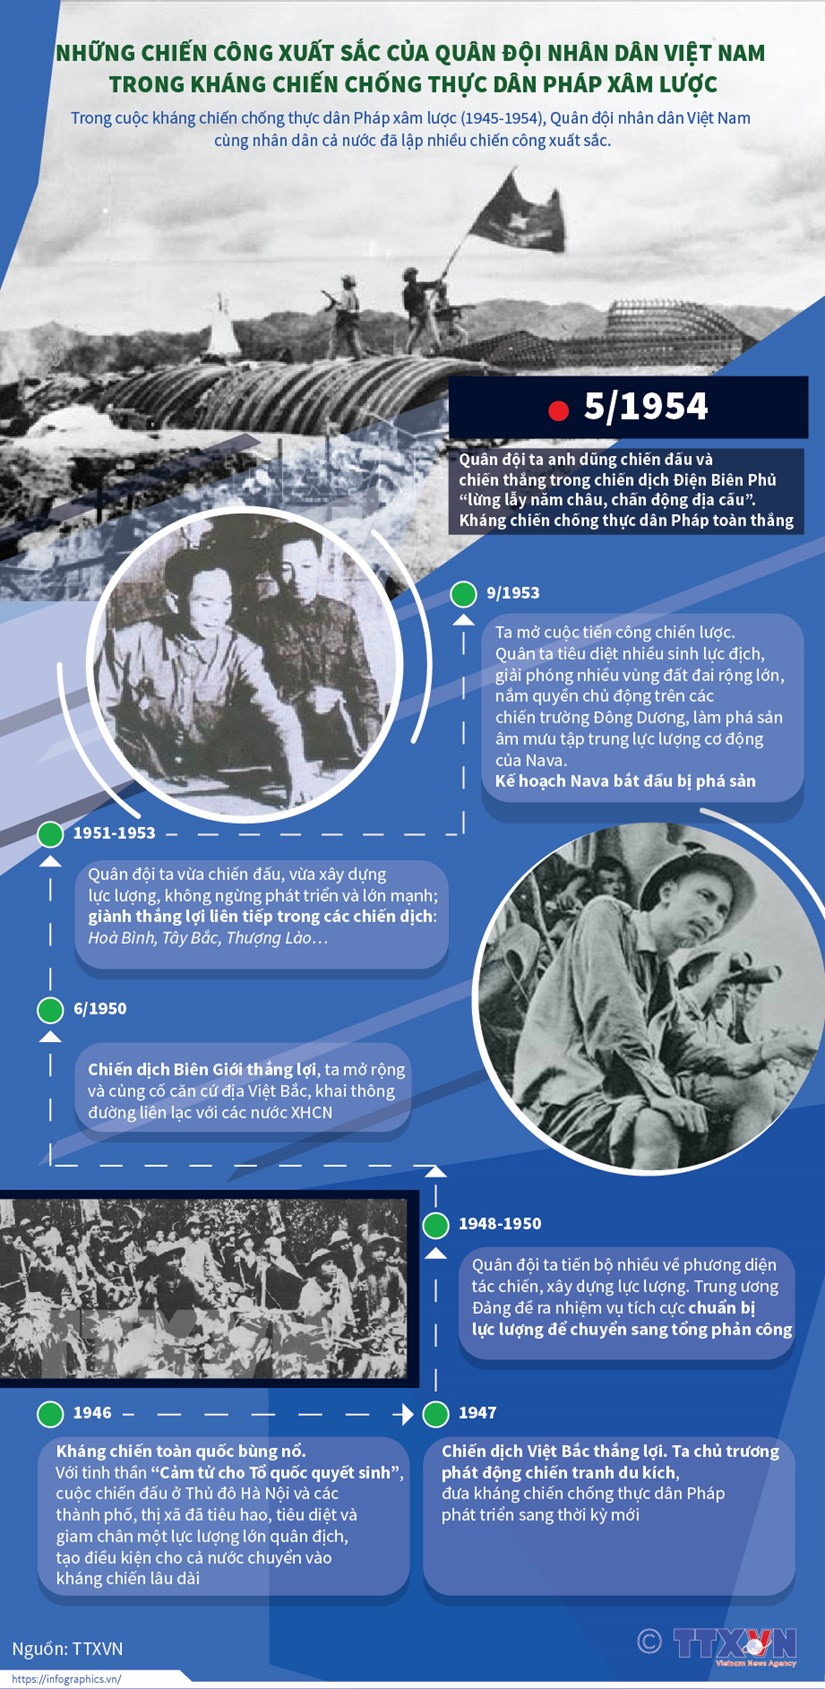 [Infographics] Chien cong cua quan doi trong khang chien chong Phap hinh anh 1